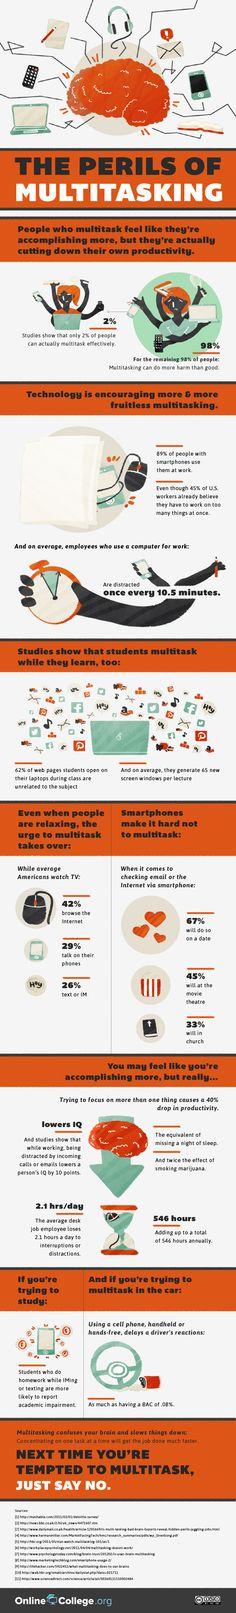 The perisl of multitasking #infographic